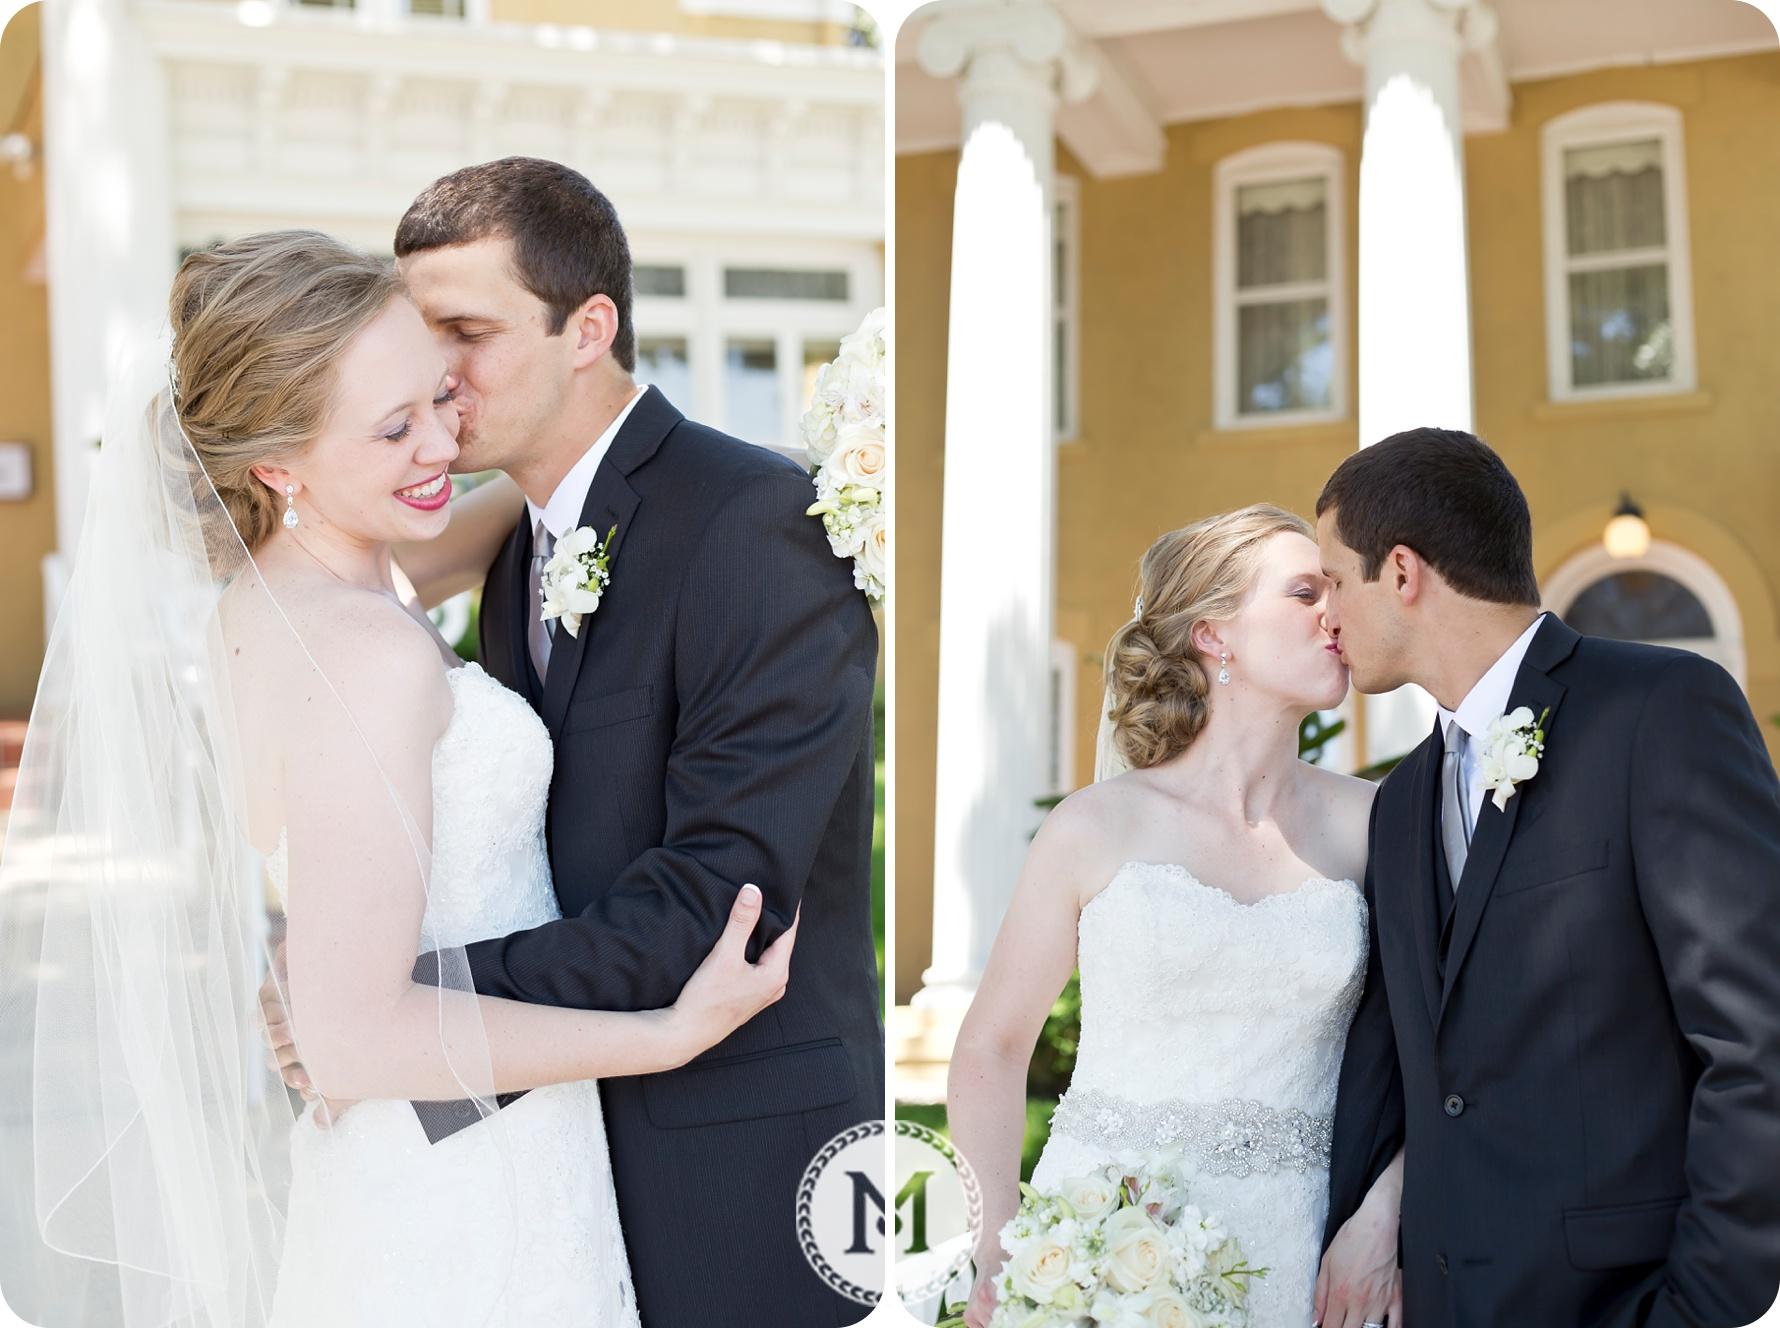 mckenziesmithphotography.com_0357